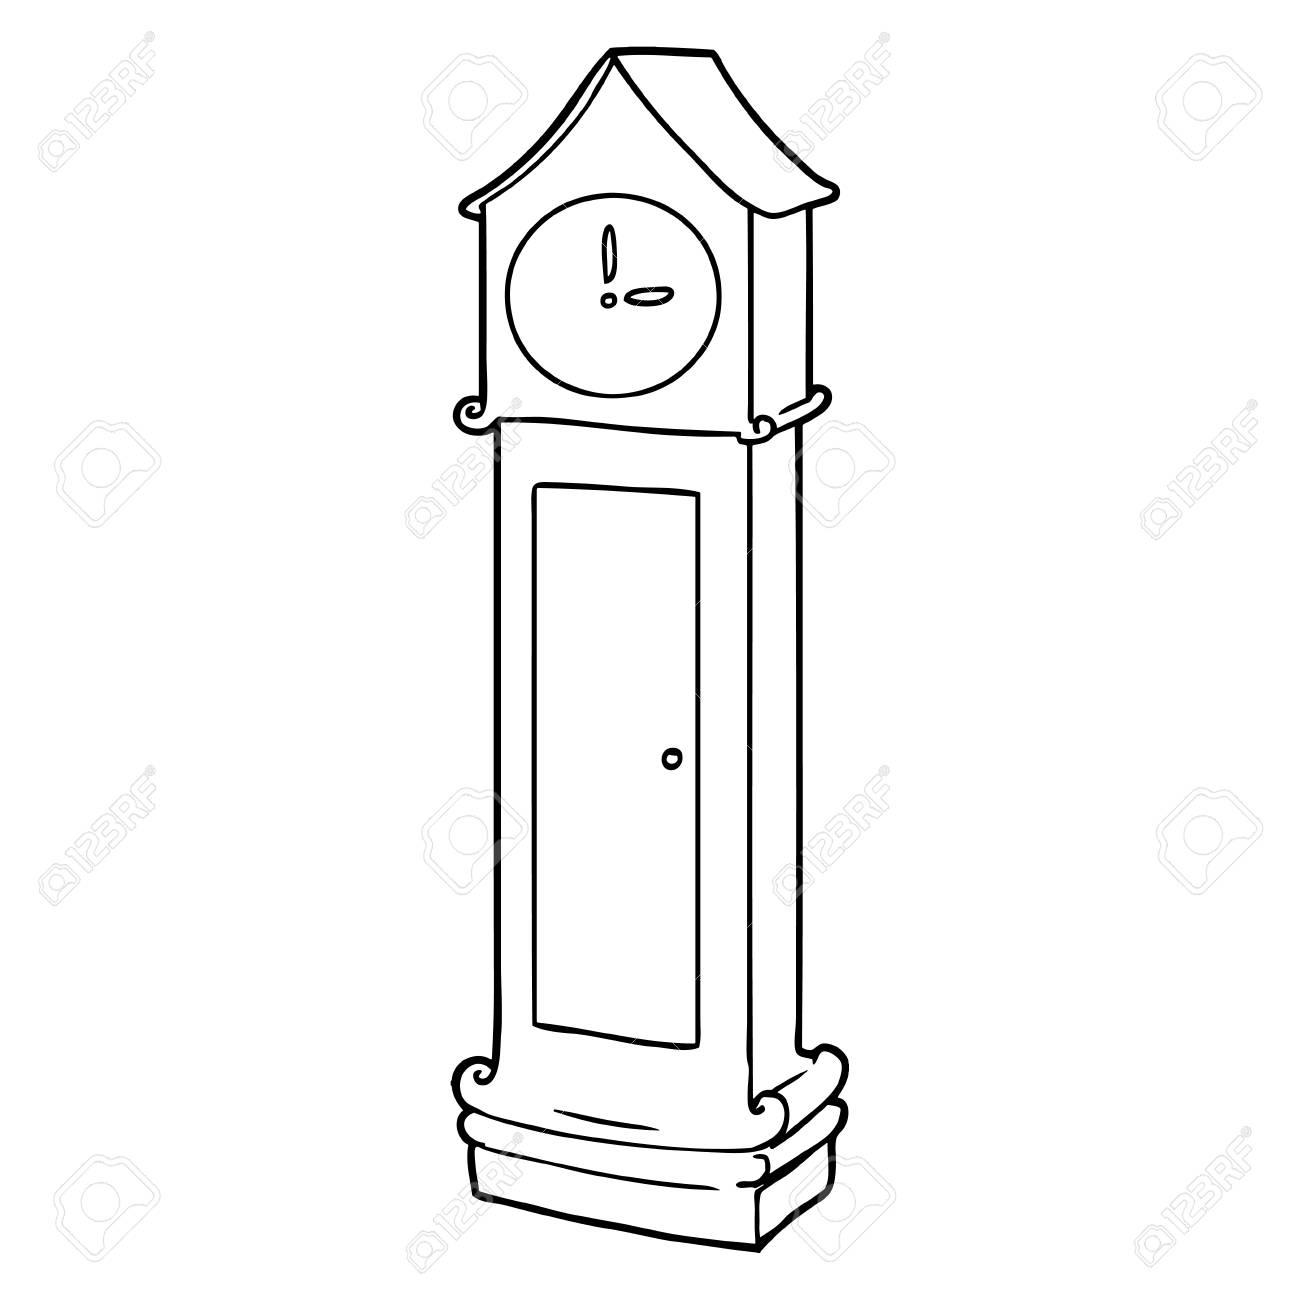 Grandfather Clock Cartoon Royalty Free Cliparts Vectors And Stock Illustration Image 94728733